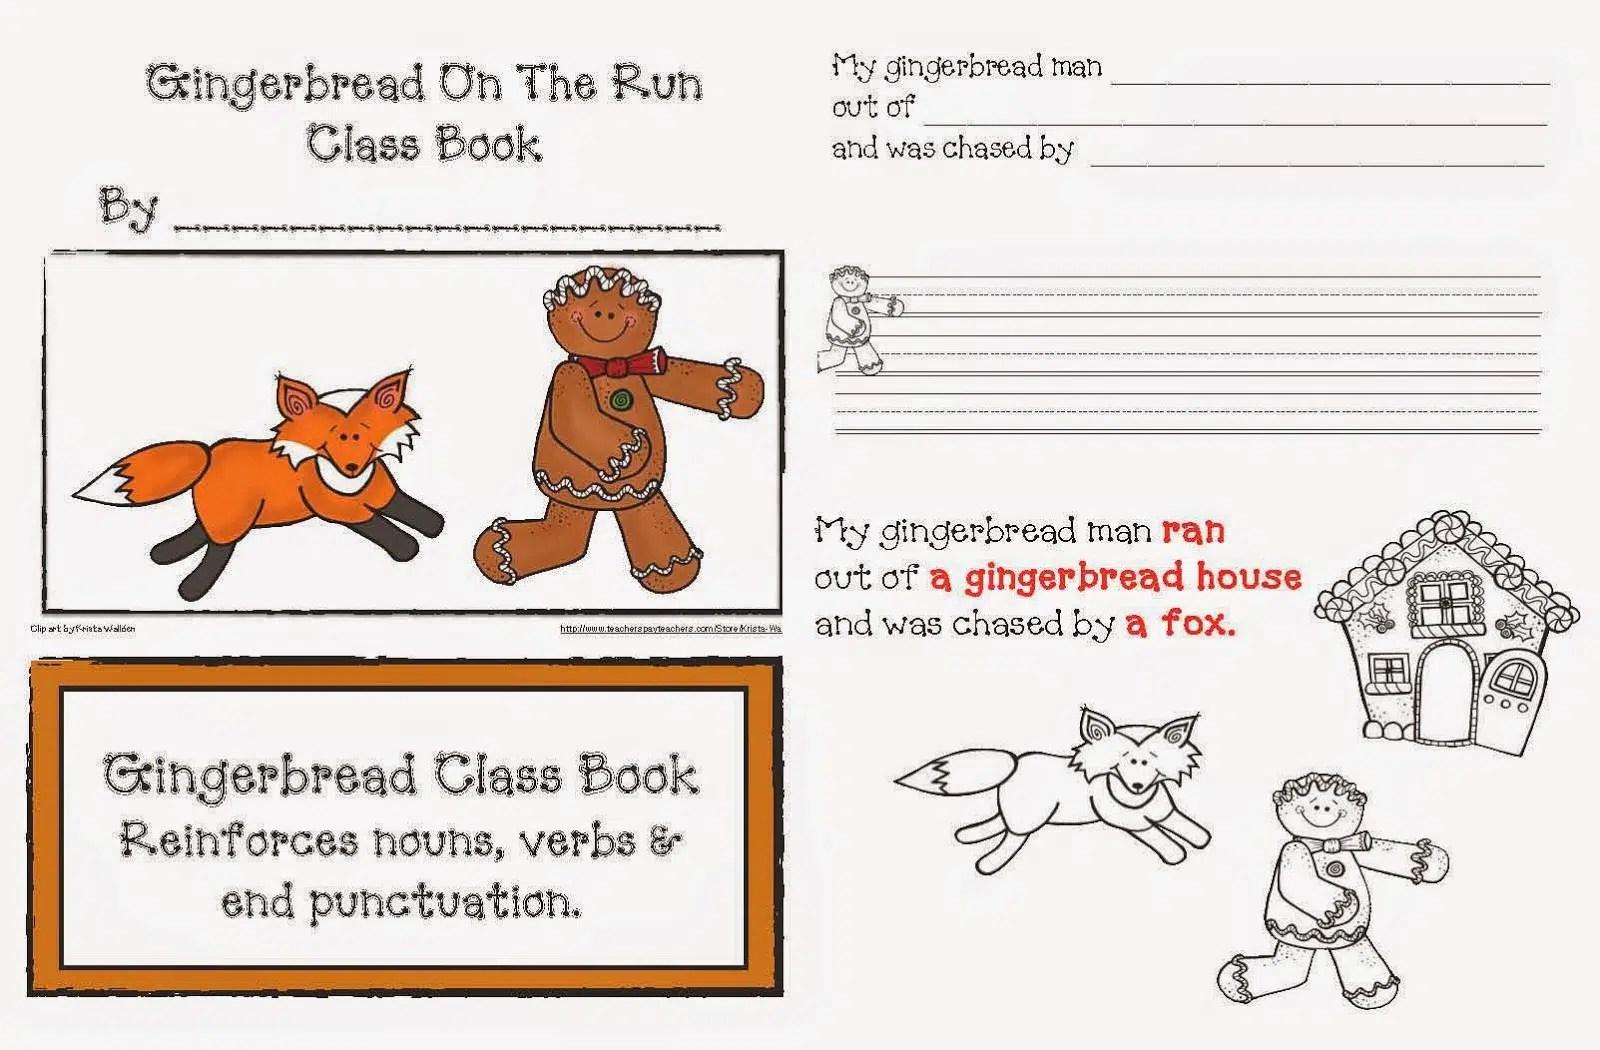 Gingerbread On The Run Class Book